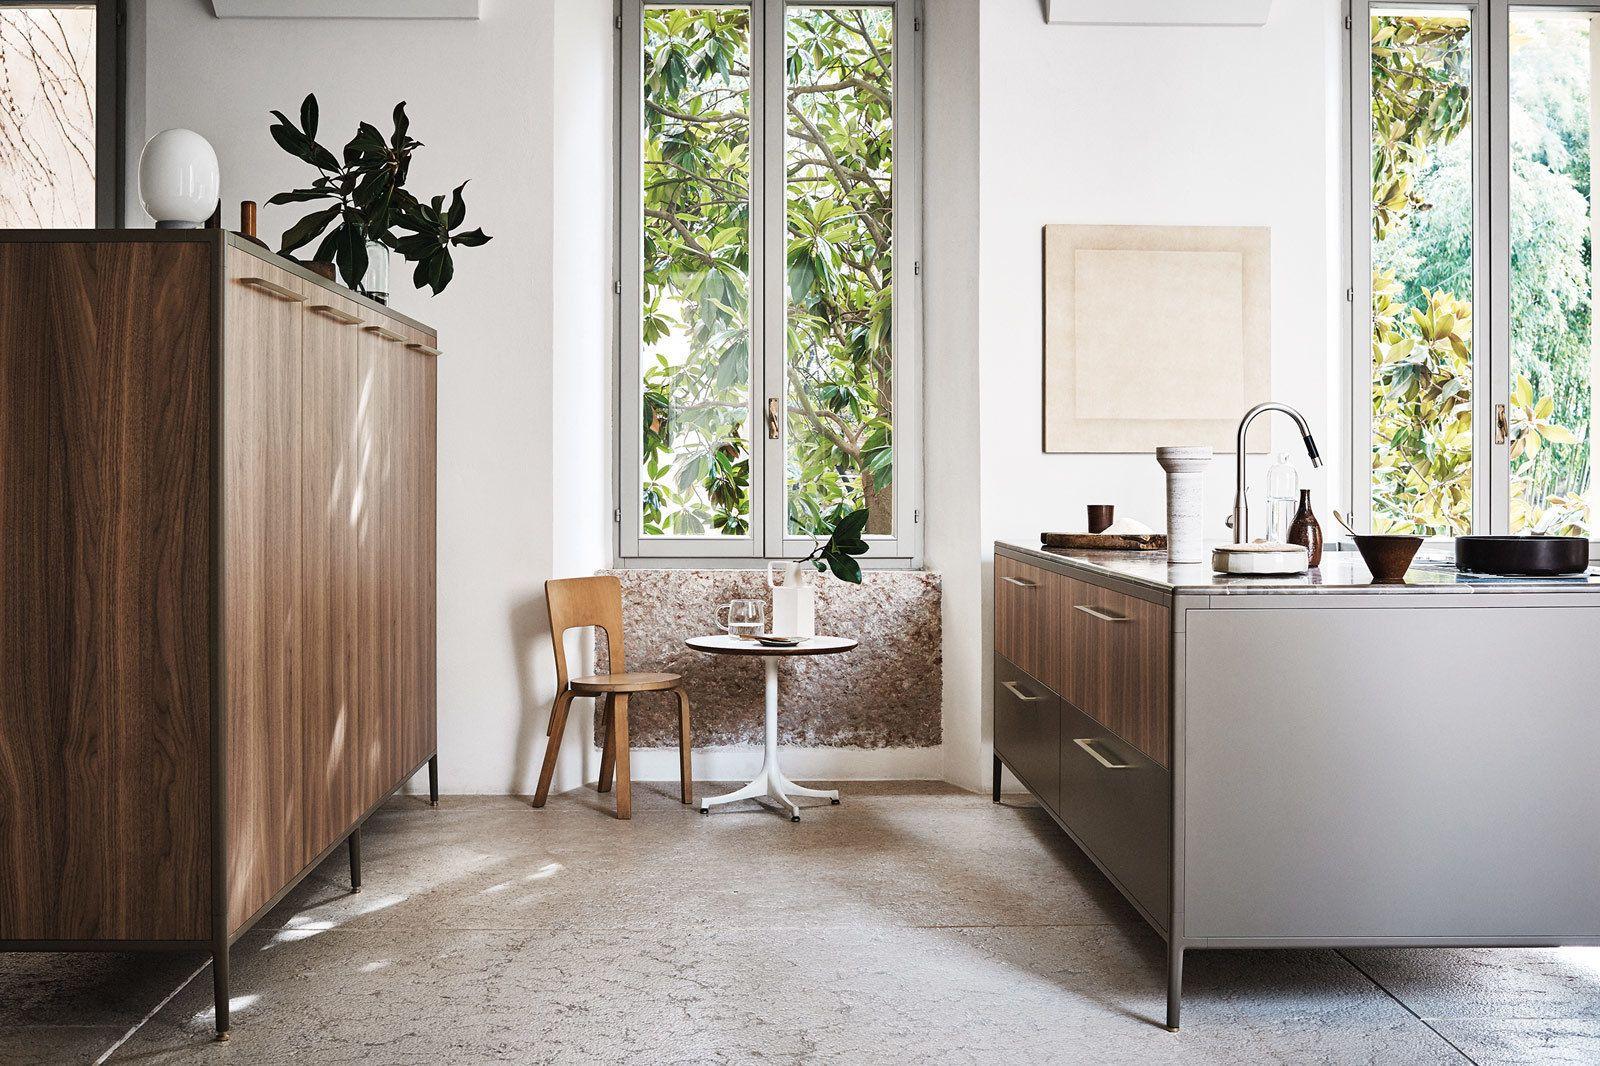 design studio garcia cumini on their cesar unit kitchen | food